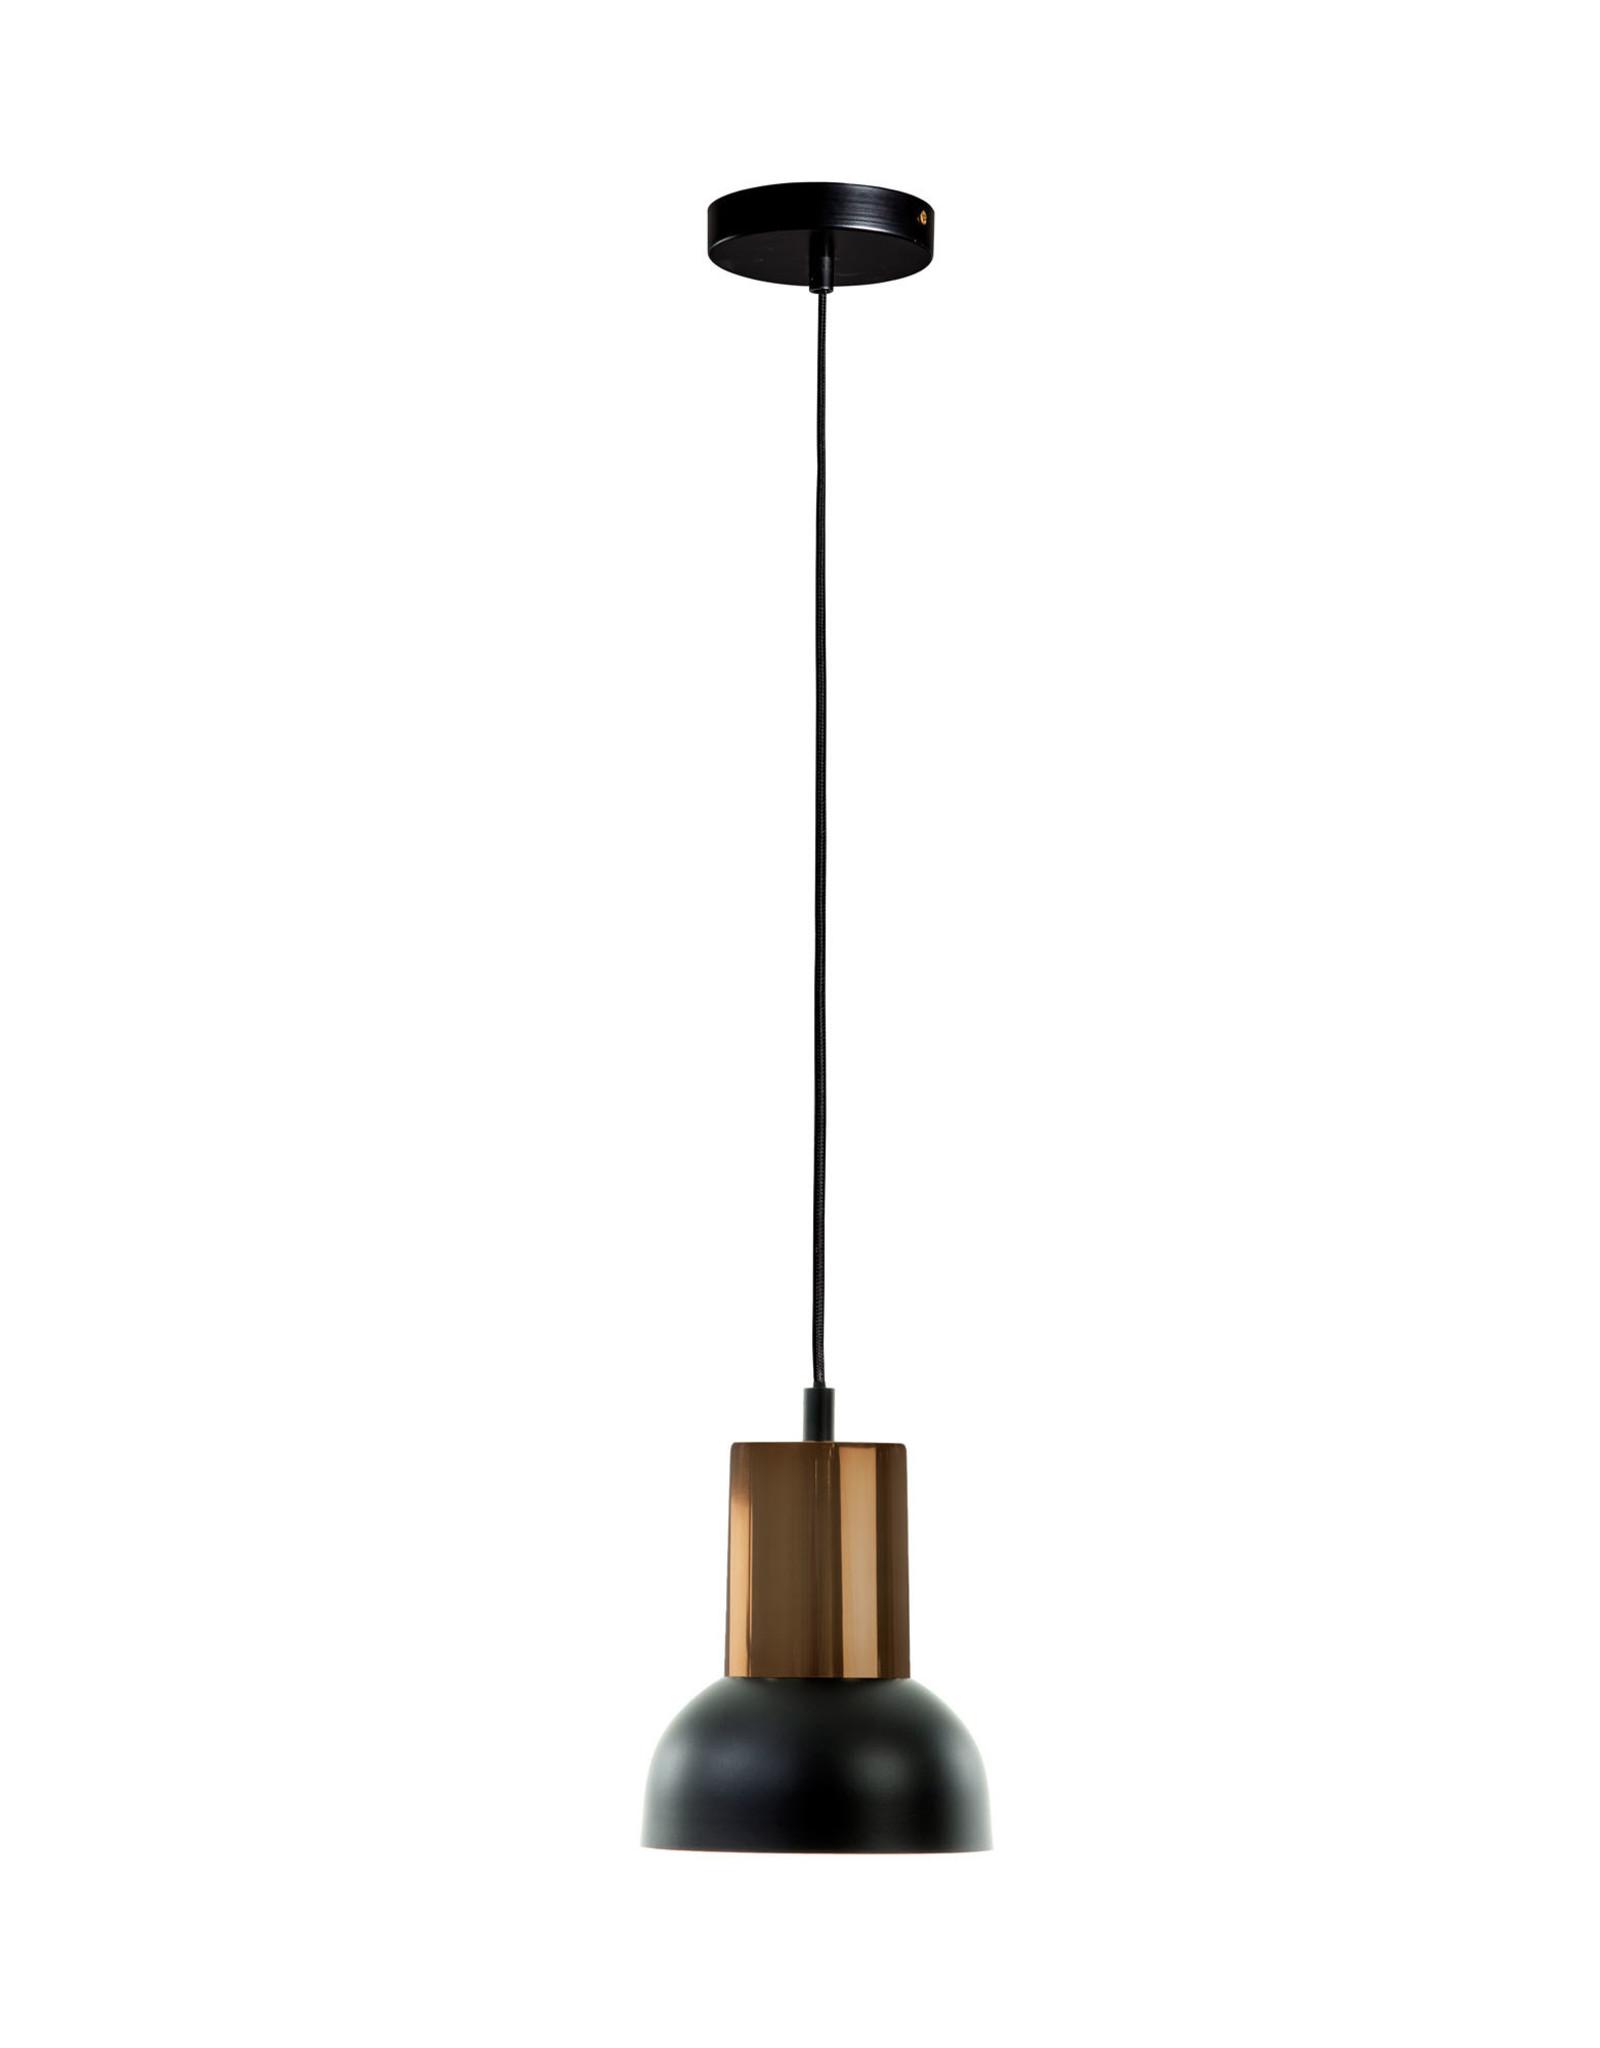 Hanglamp Black & Copper